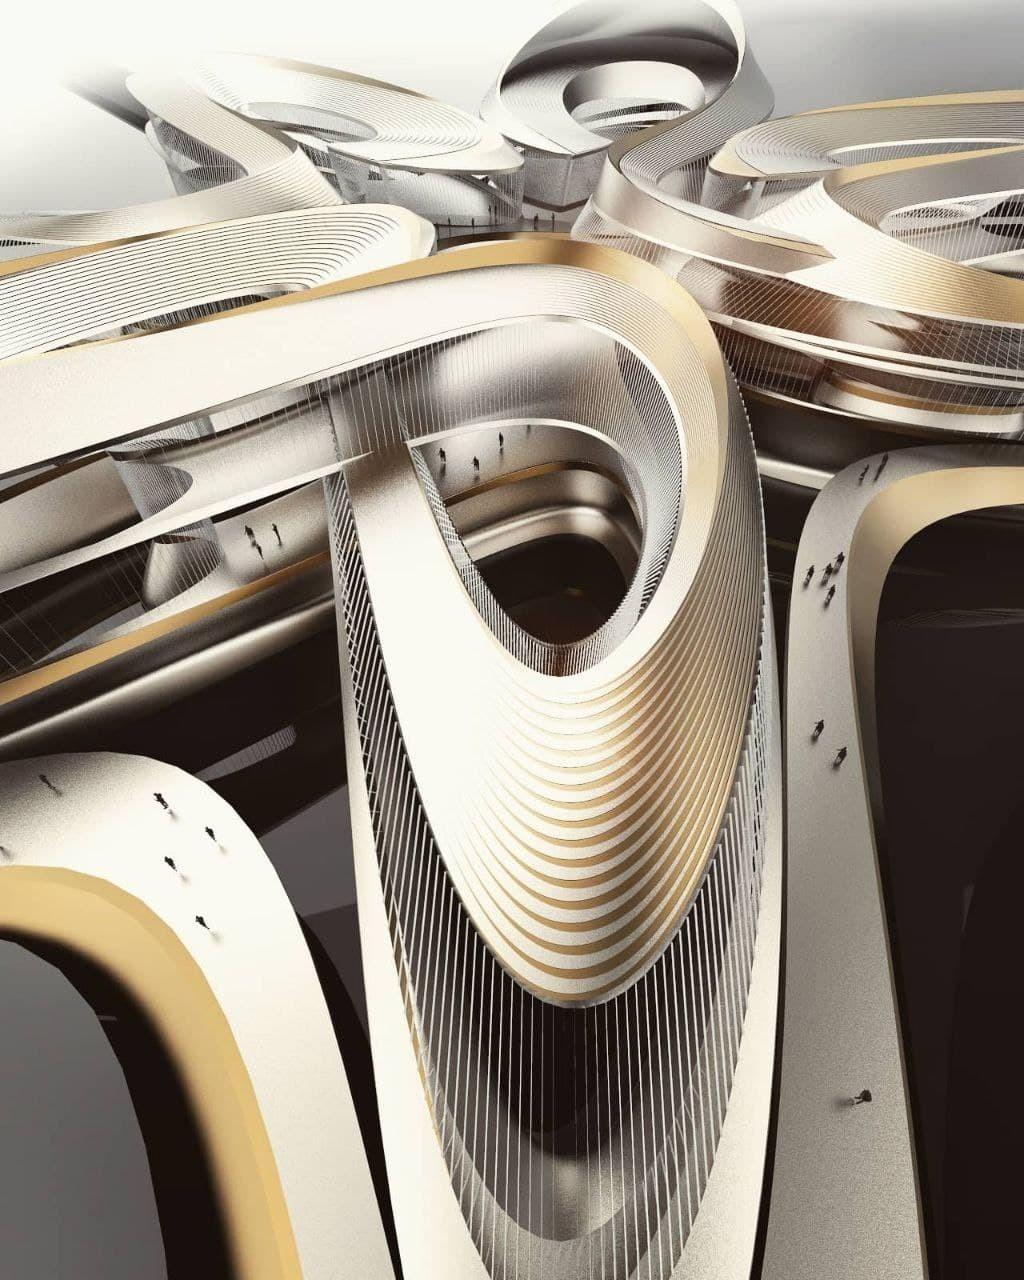 Futurly | Fluidity 2.0 Architecture and Design